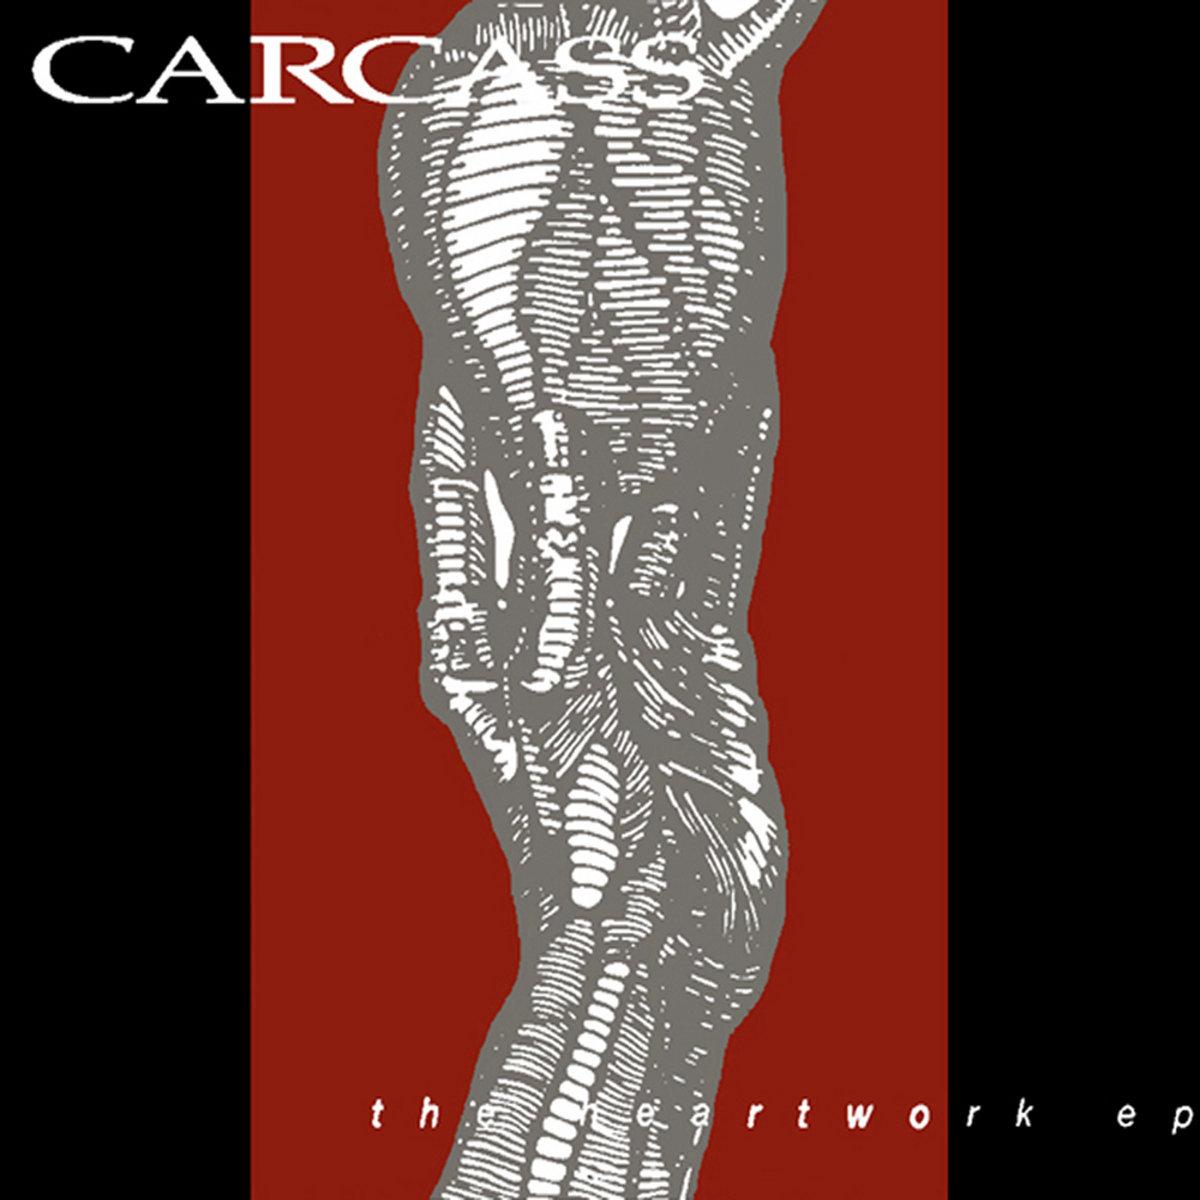 carcass heartwork mp3